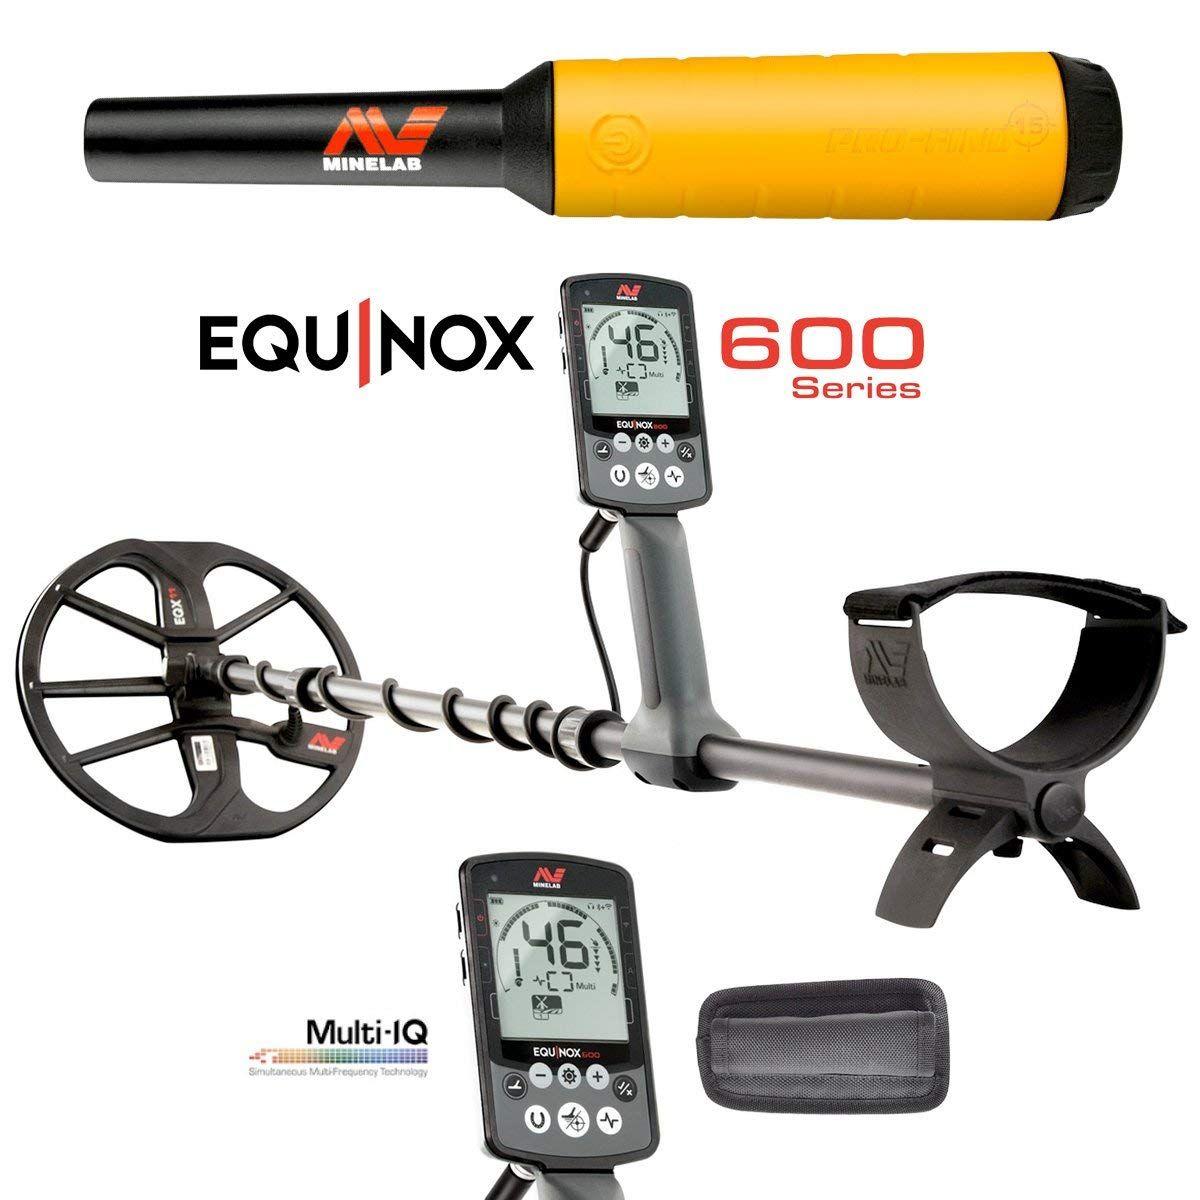 minelab equinox 800 usb charger